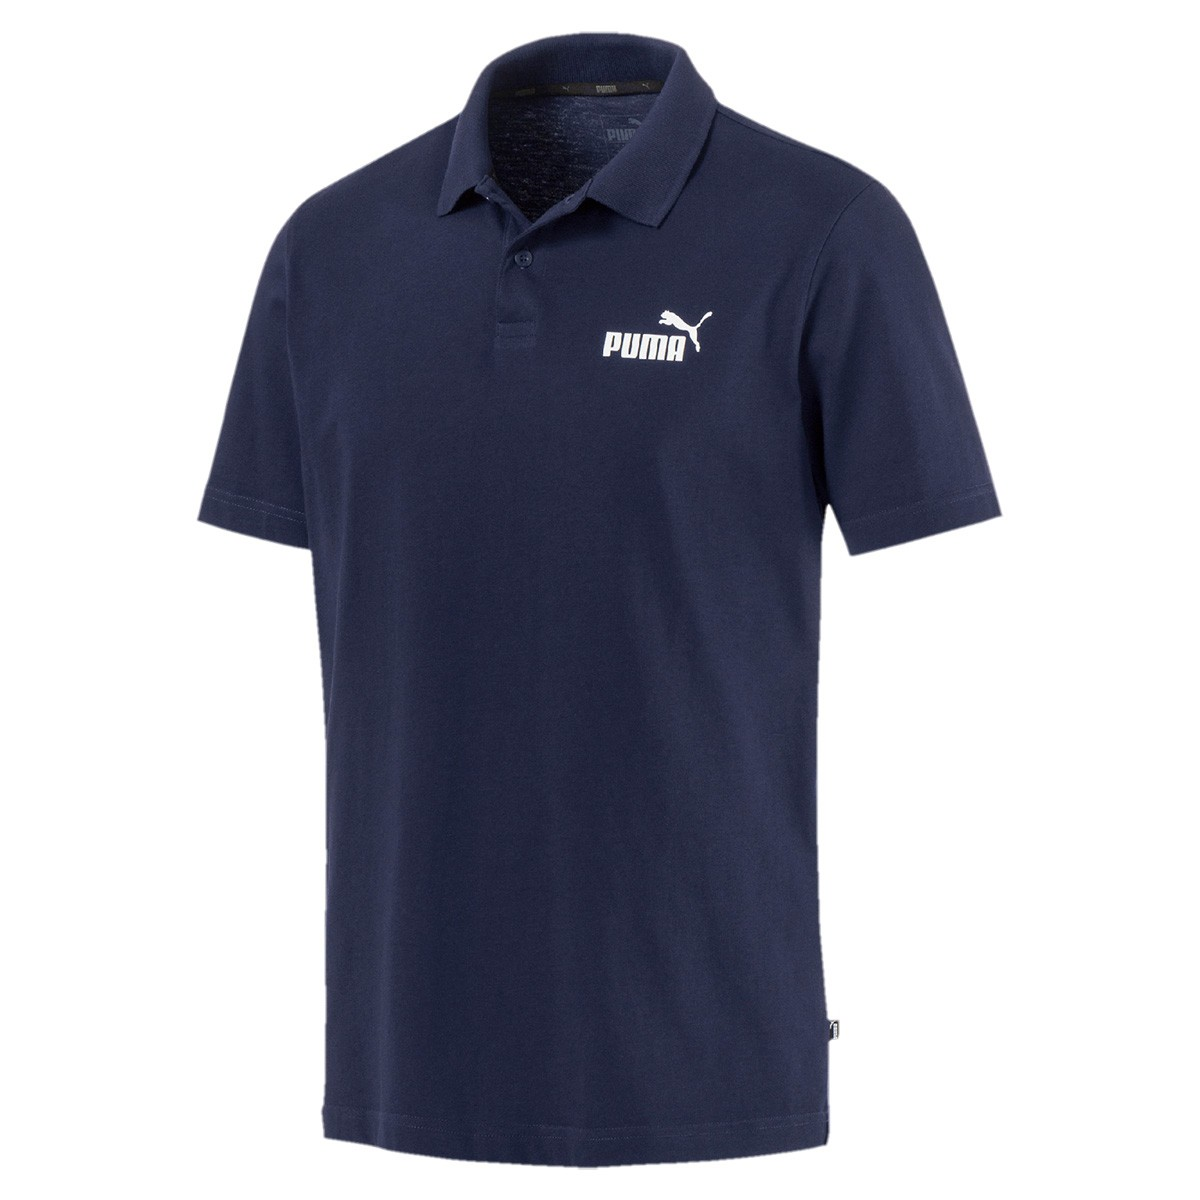 Camisa Polo Puma ESS Jersey Masculina Azul Marinho